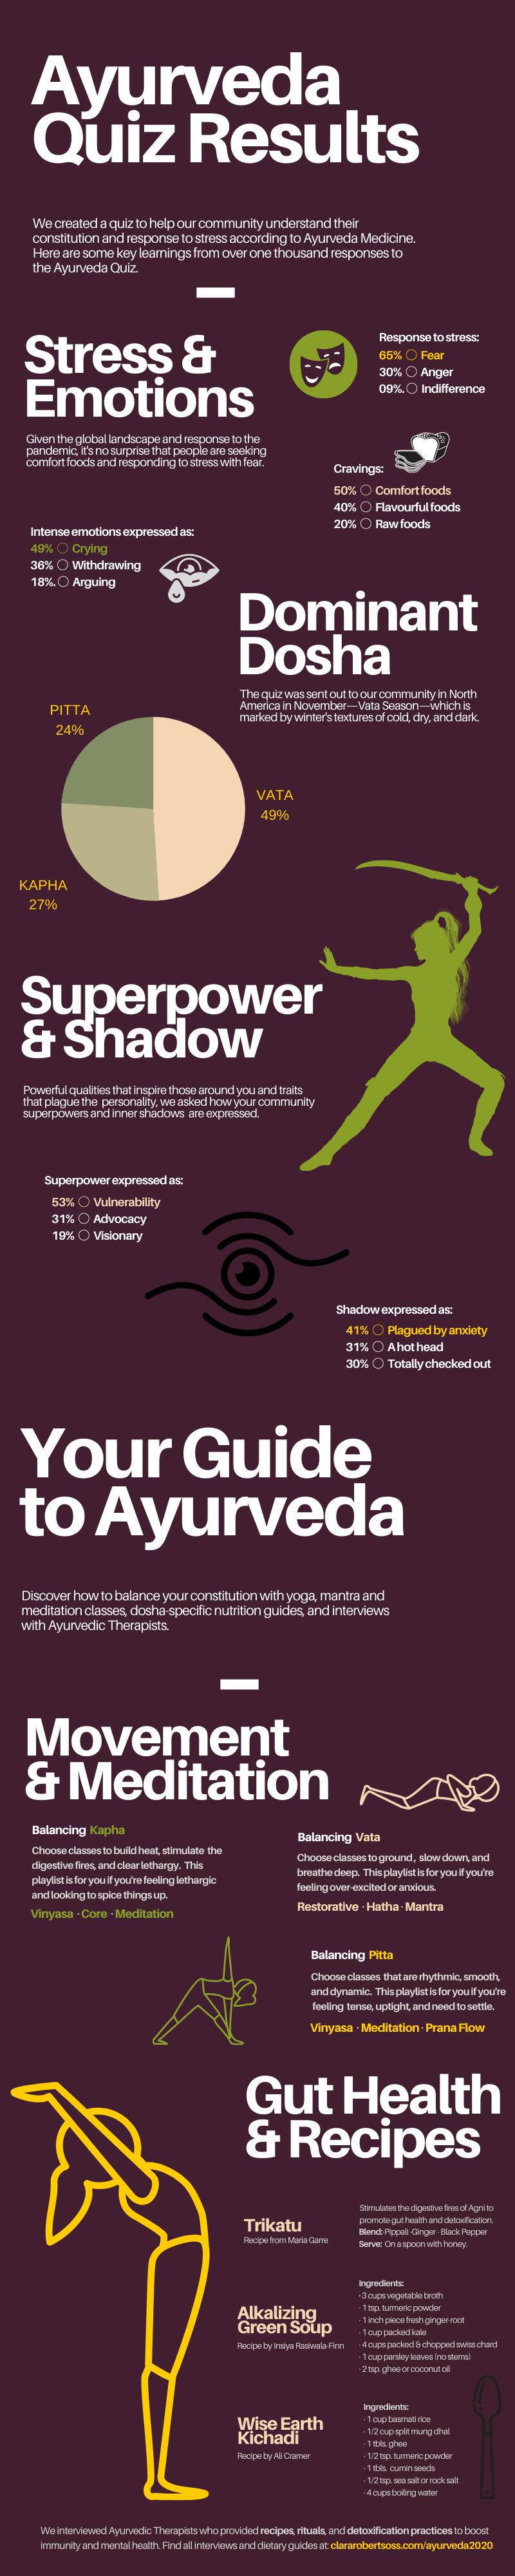 Ayurveda Infographic